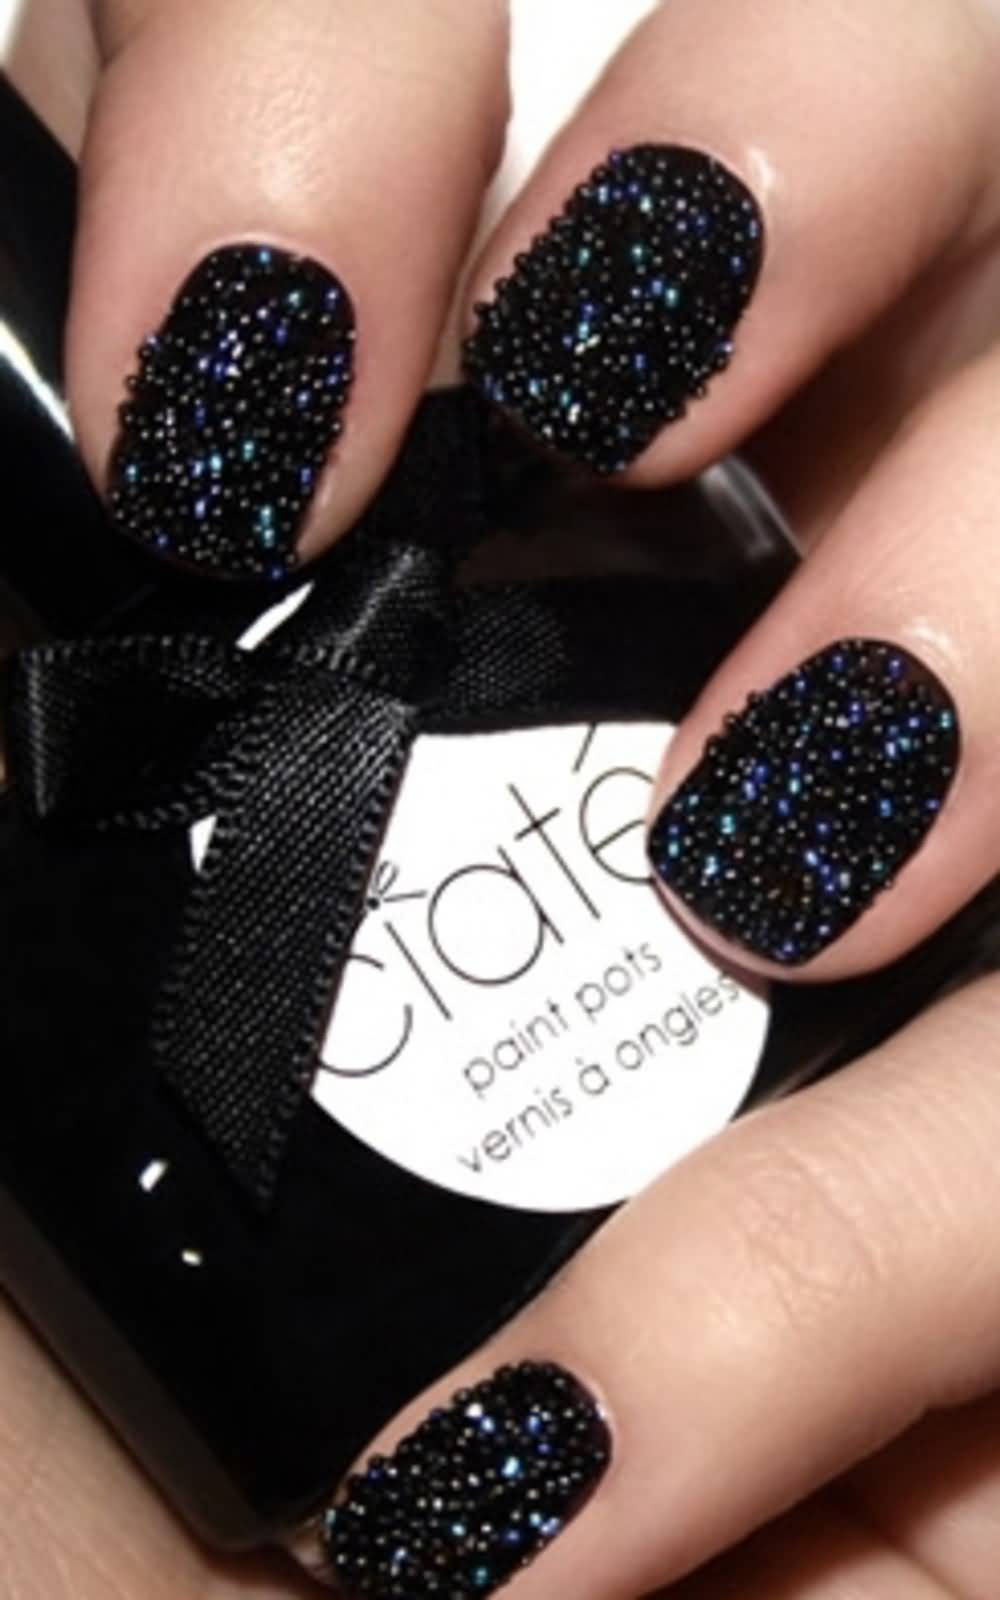 caviar-nail-polish4 The Easiest Way to Apply Caviar Manicure